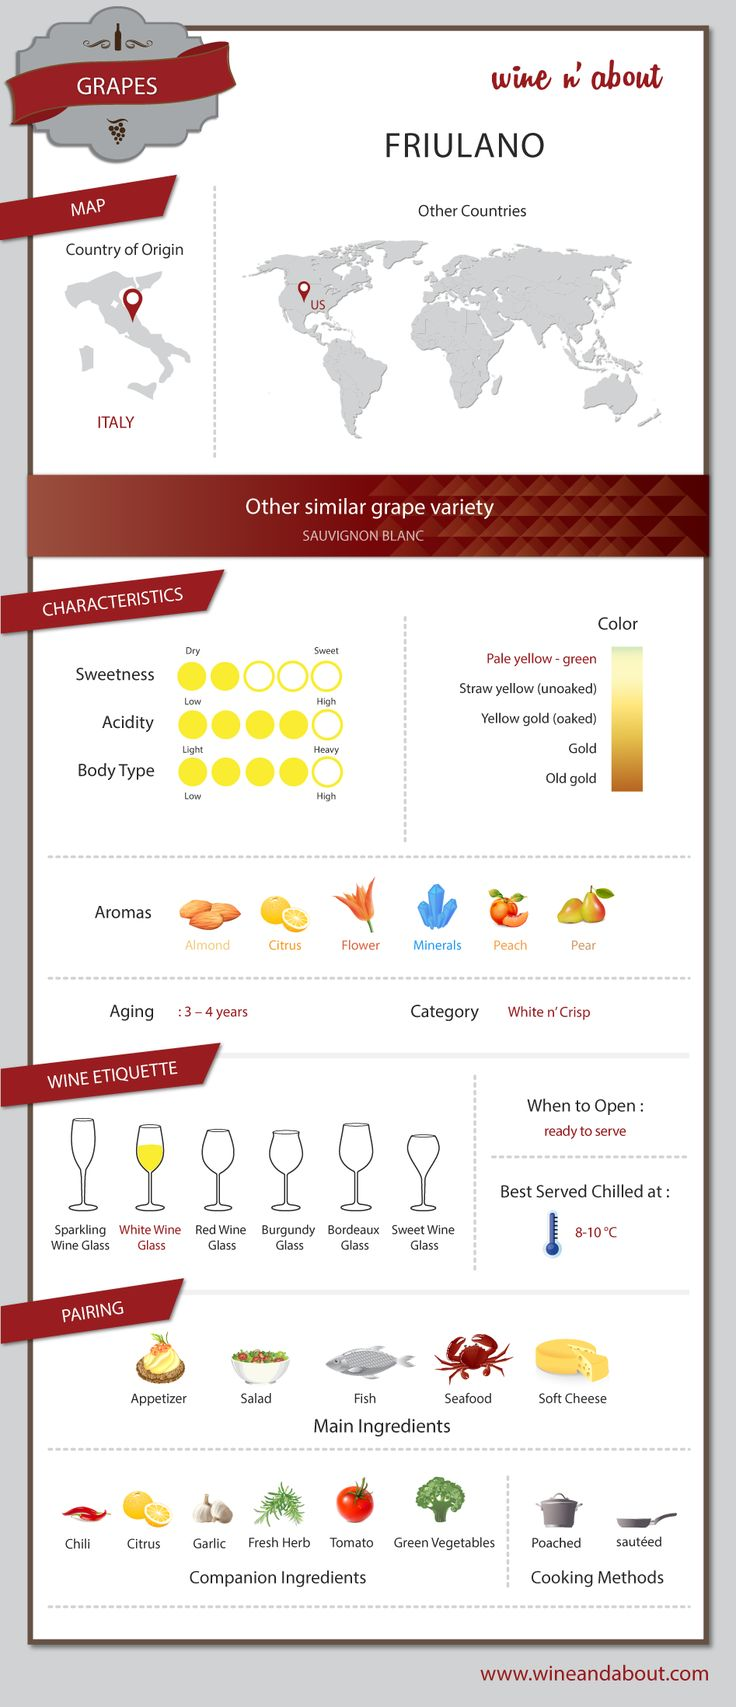 Вино сорта - Friulano